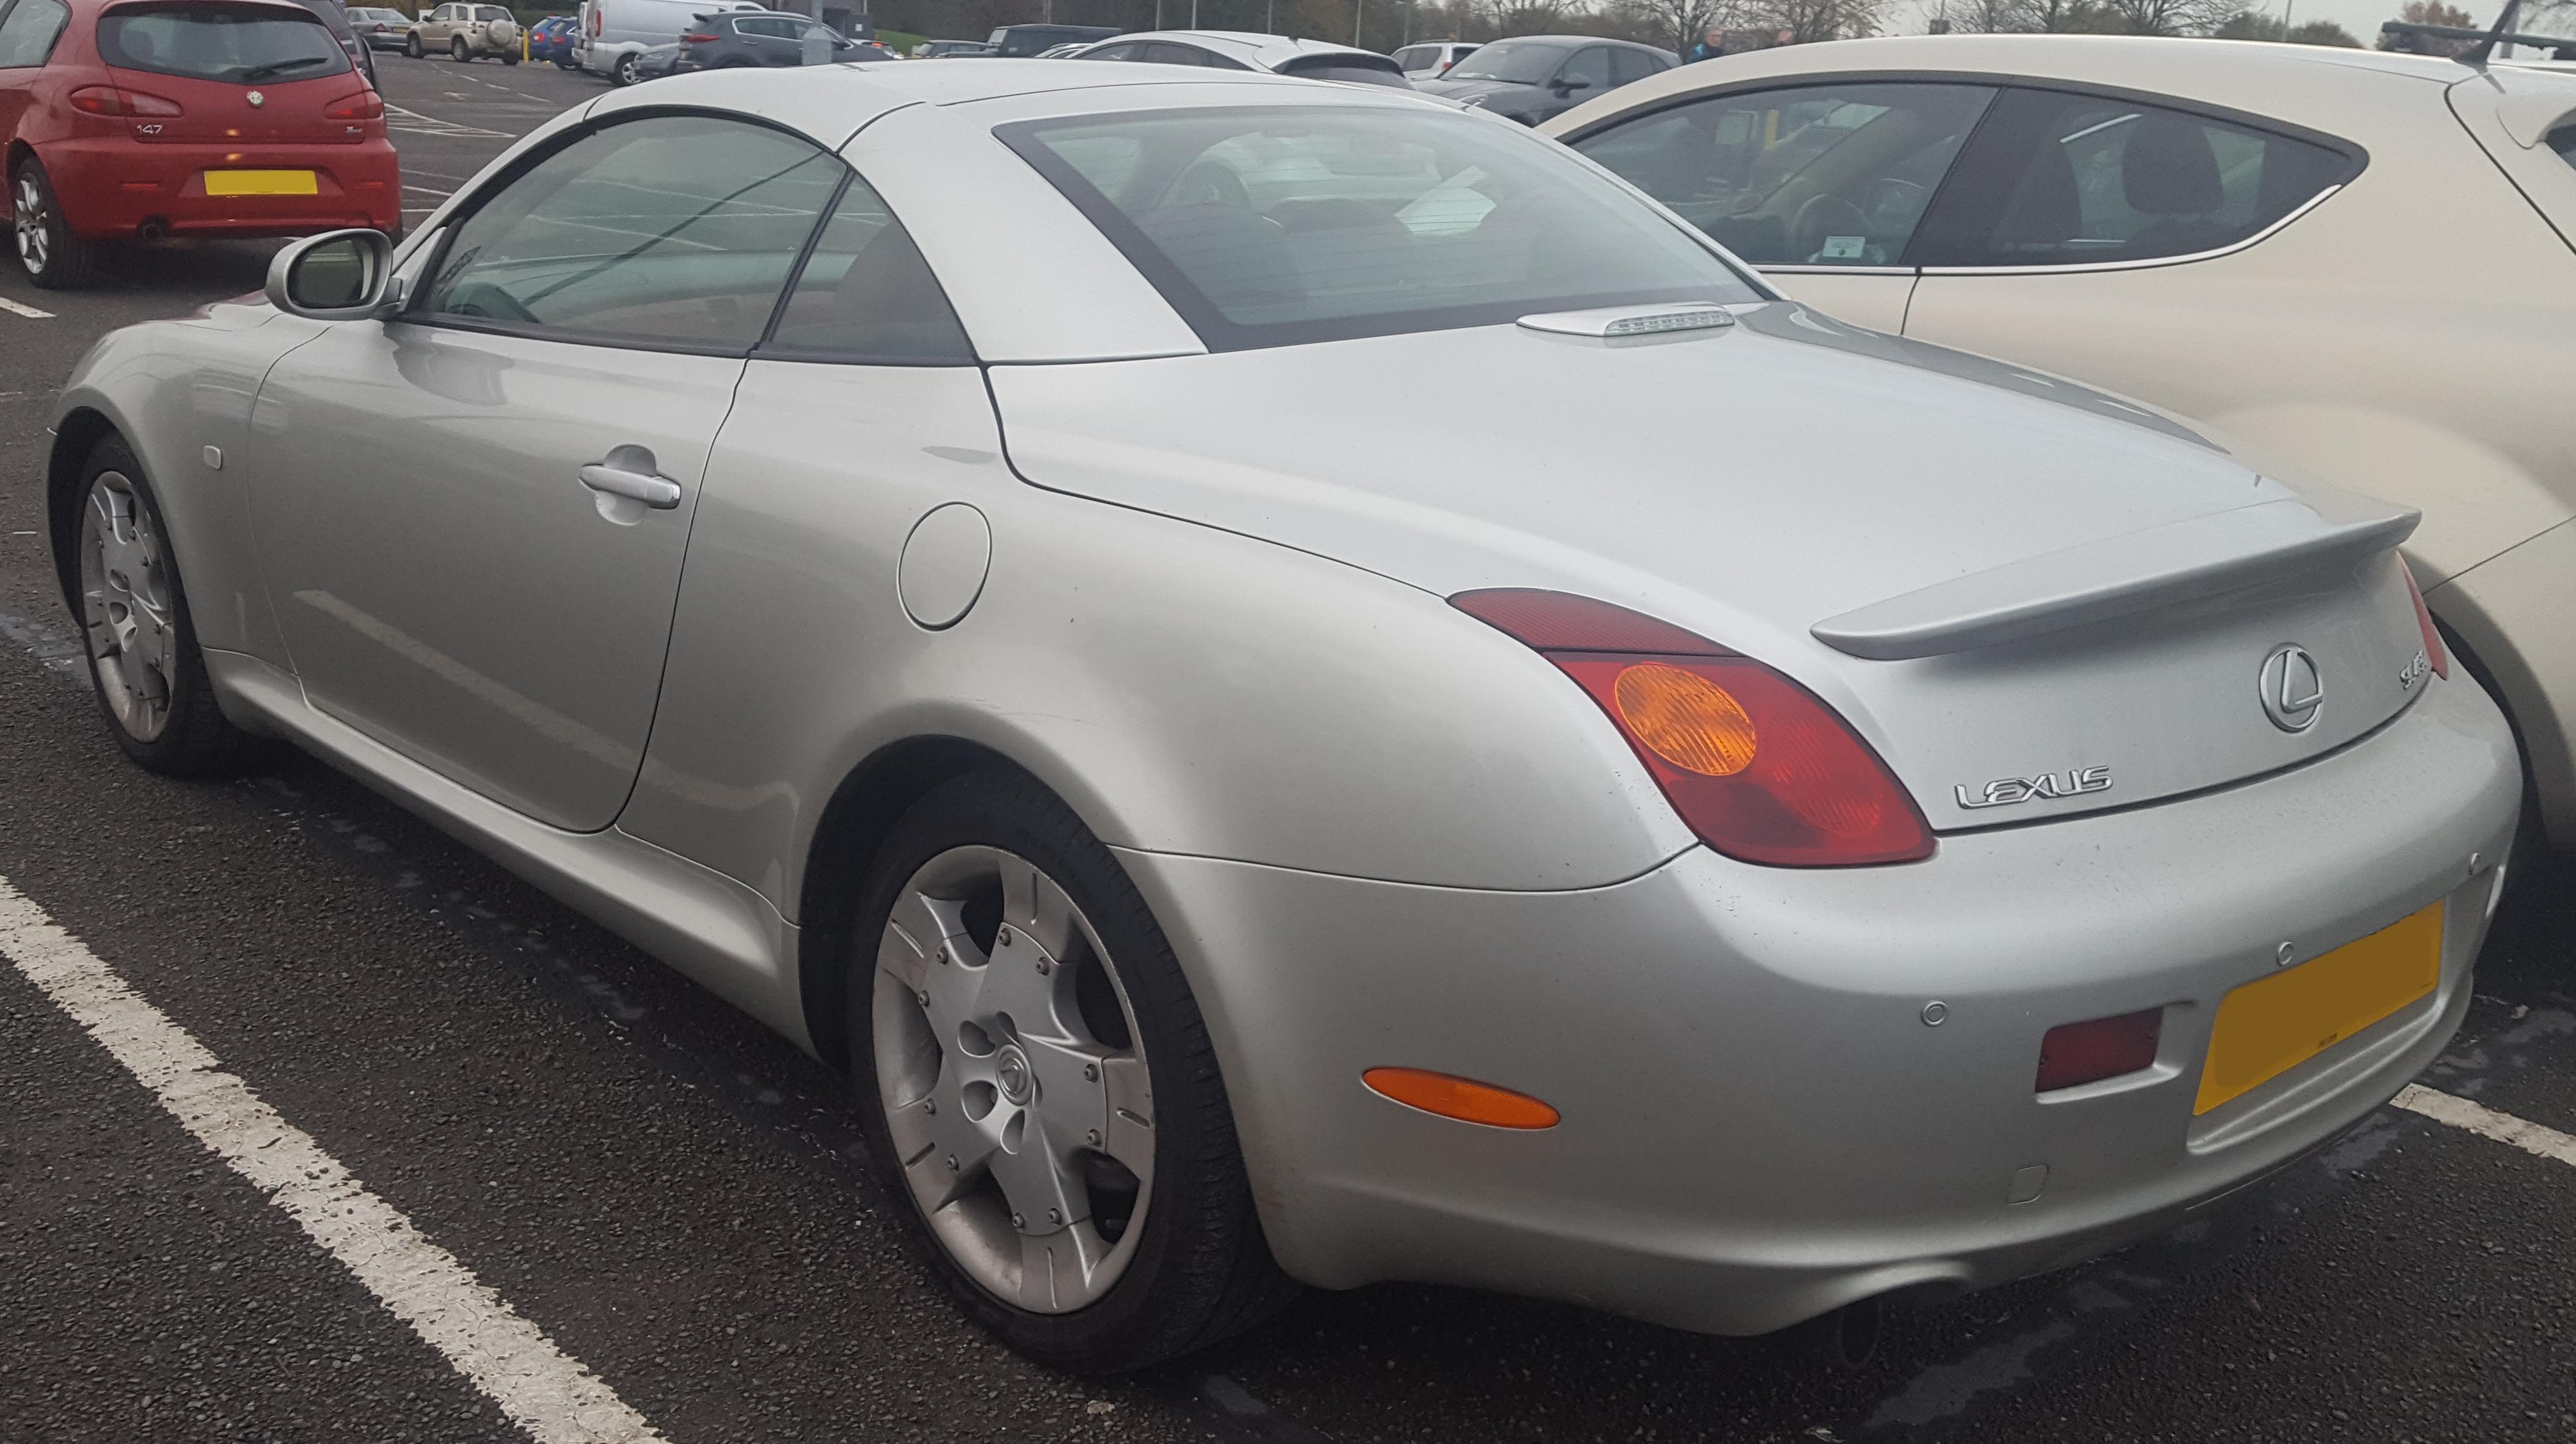 https://upload.wikimedia.org/wikipedia/commons/e/eb/2002_Lexus_SC430_Automatic_4.3_Rear.jpg